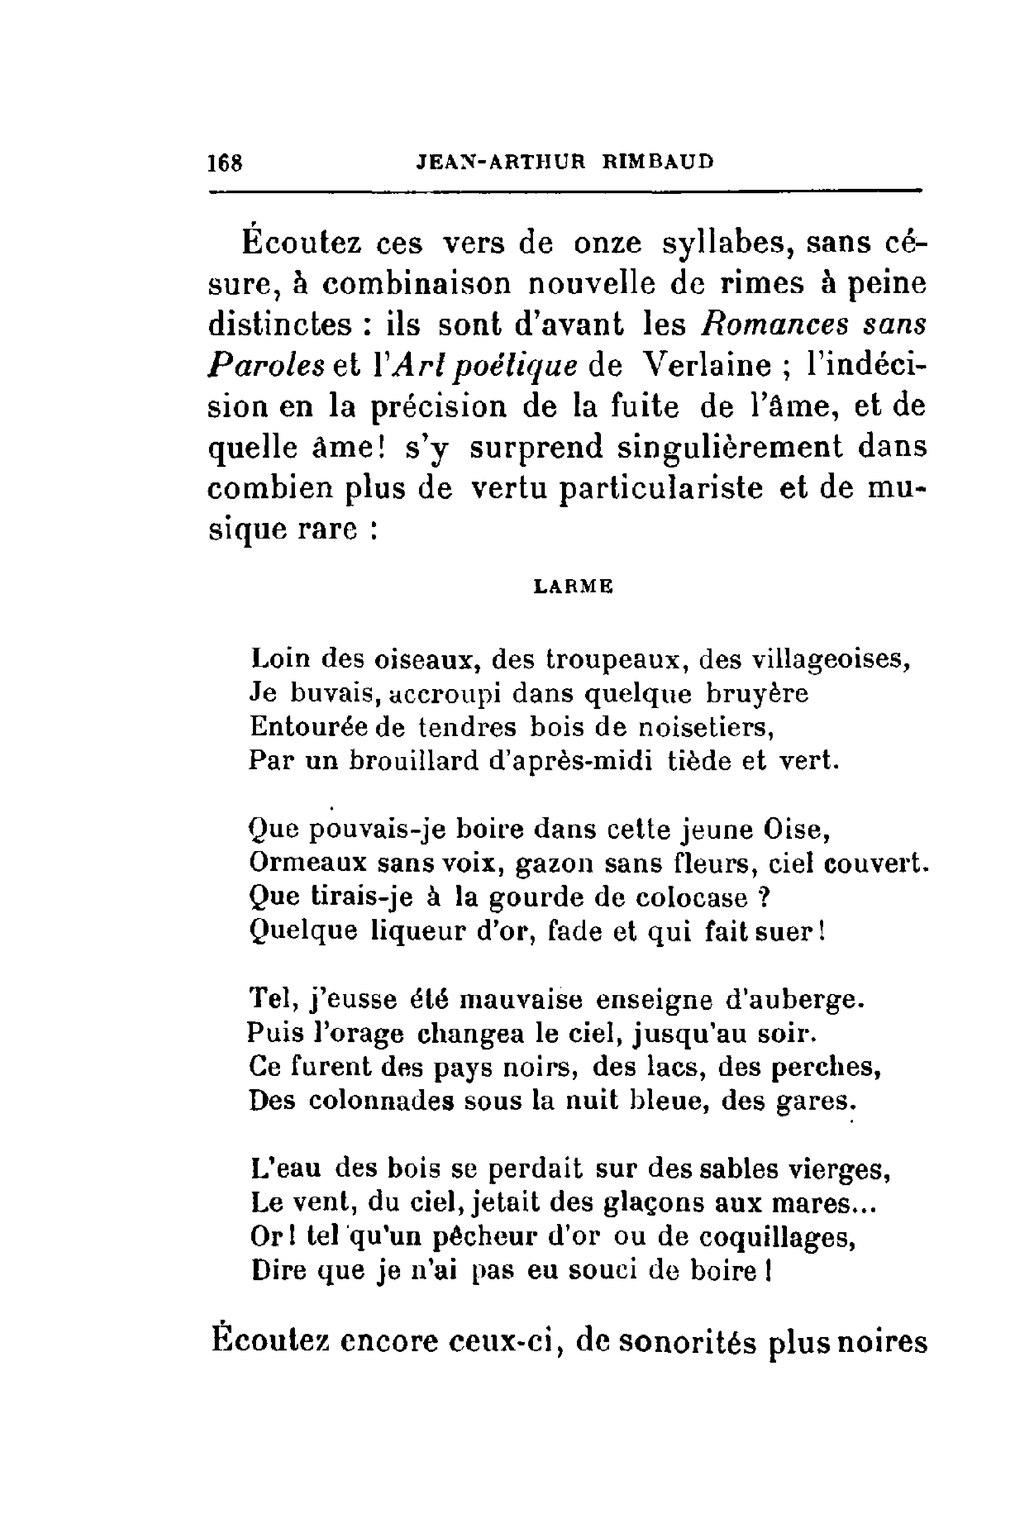 Pageberrichon Jean Arthur Rimbaud 1912djvu167 Wikisource